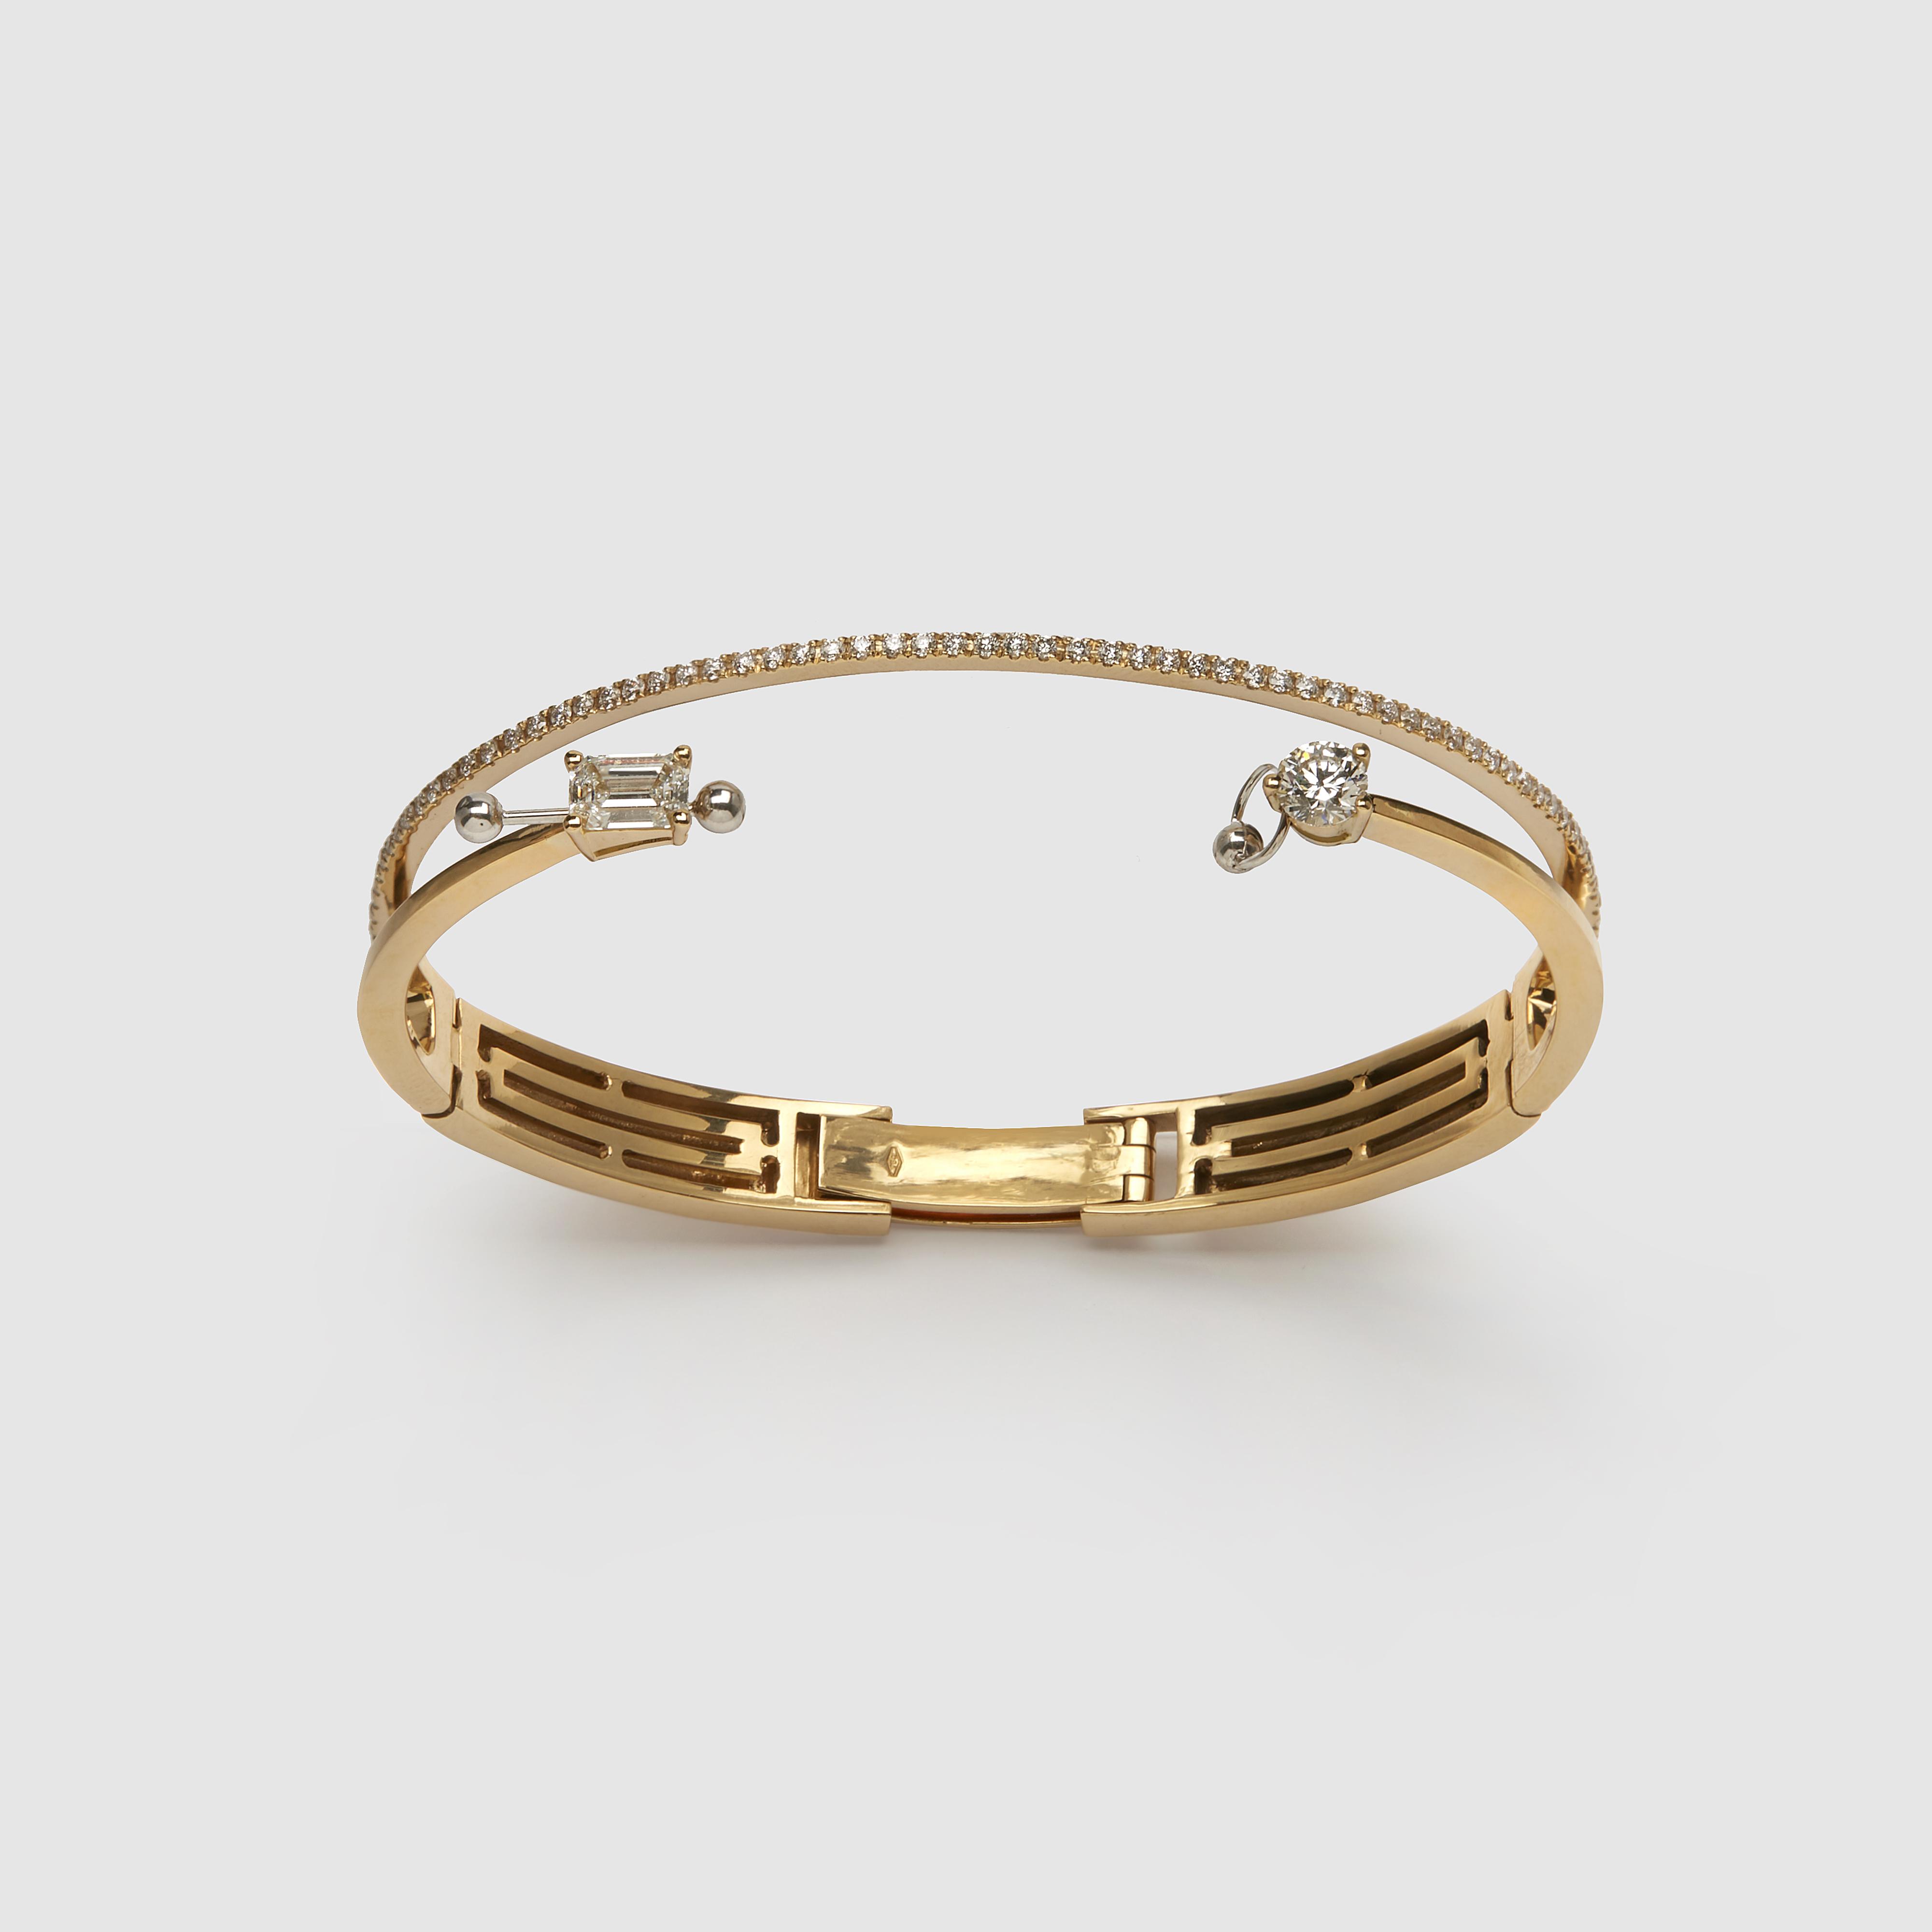 A bracelet by Delfina Delettrez Fendi.